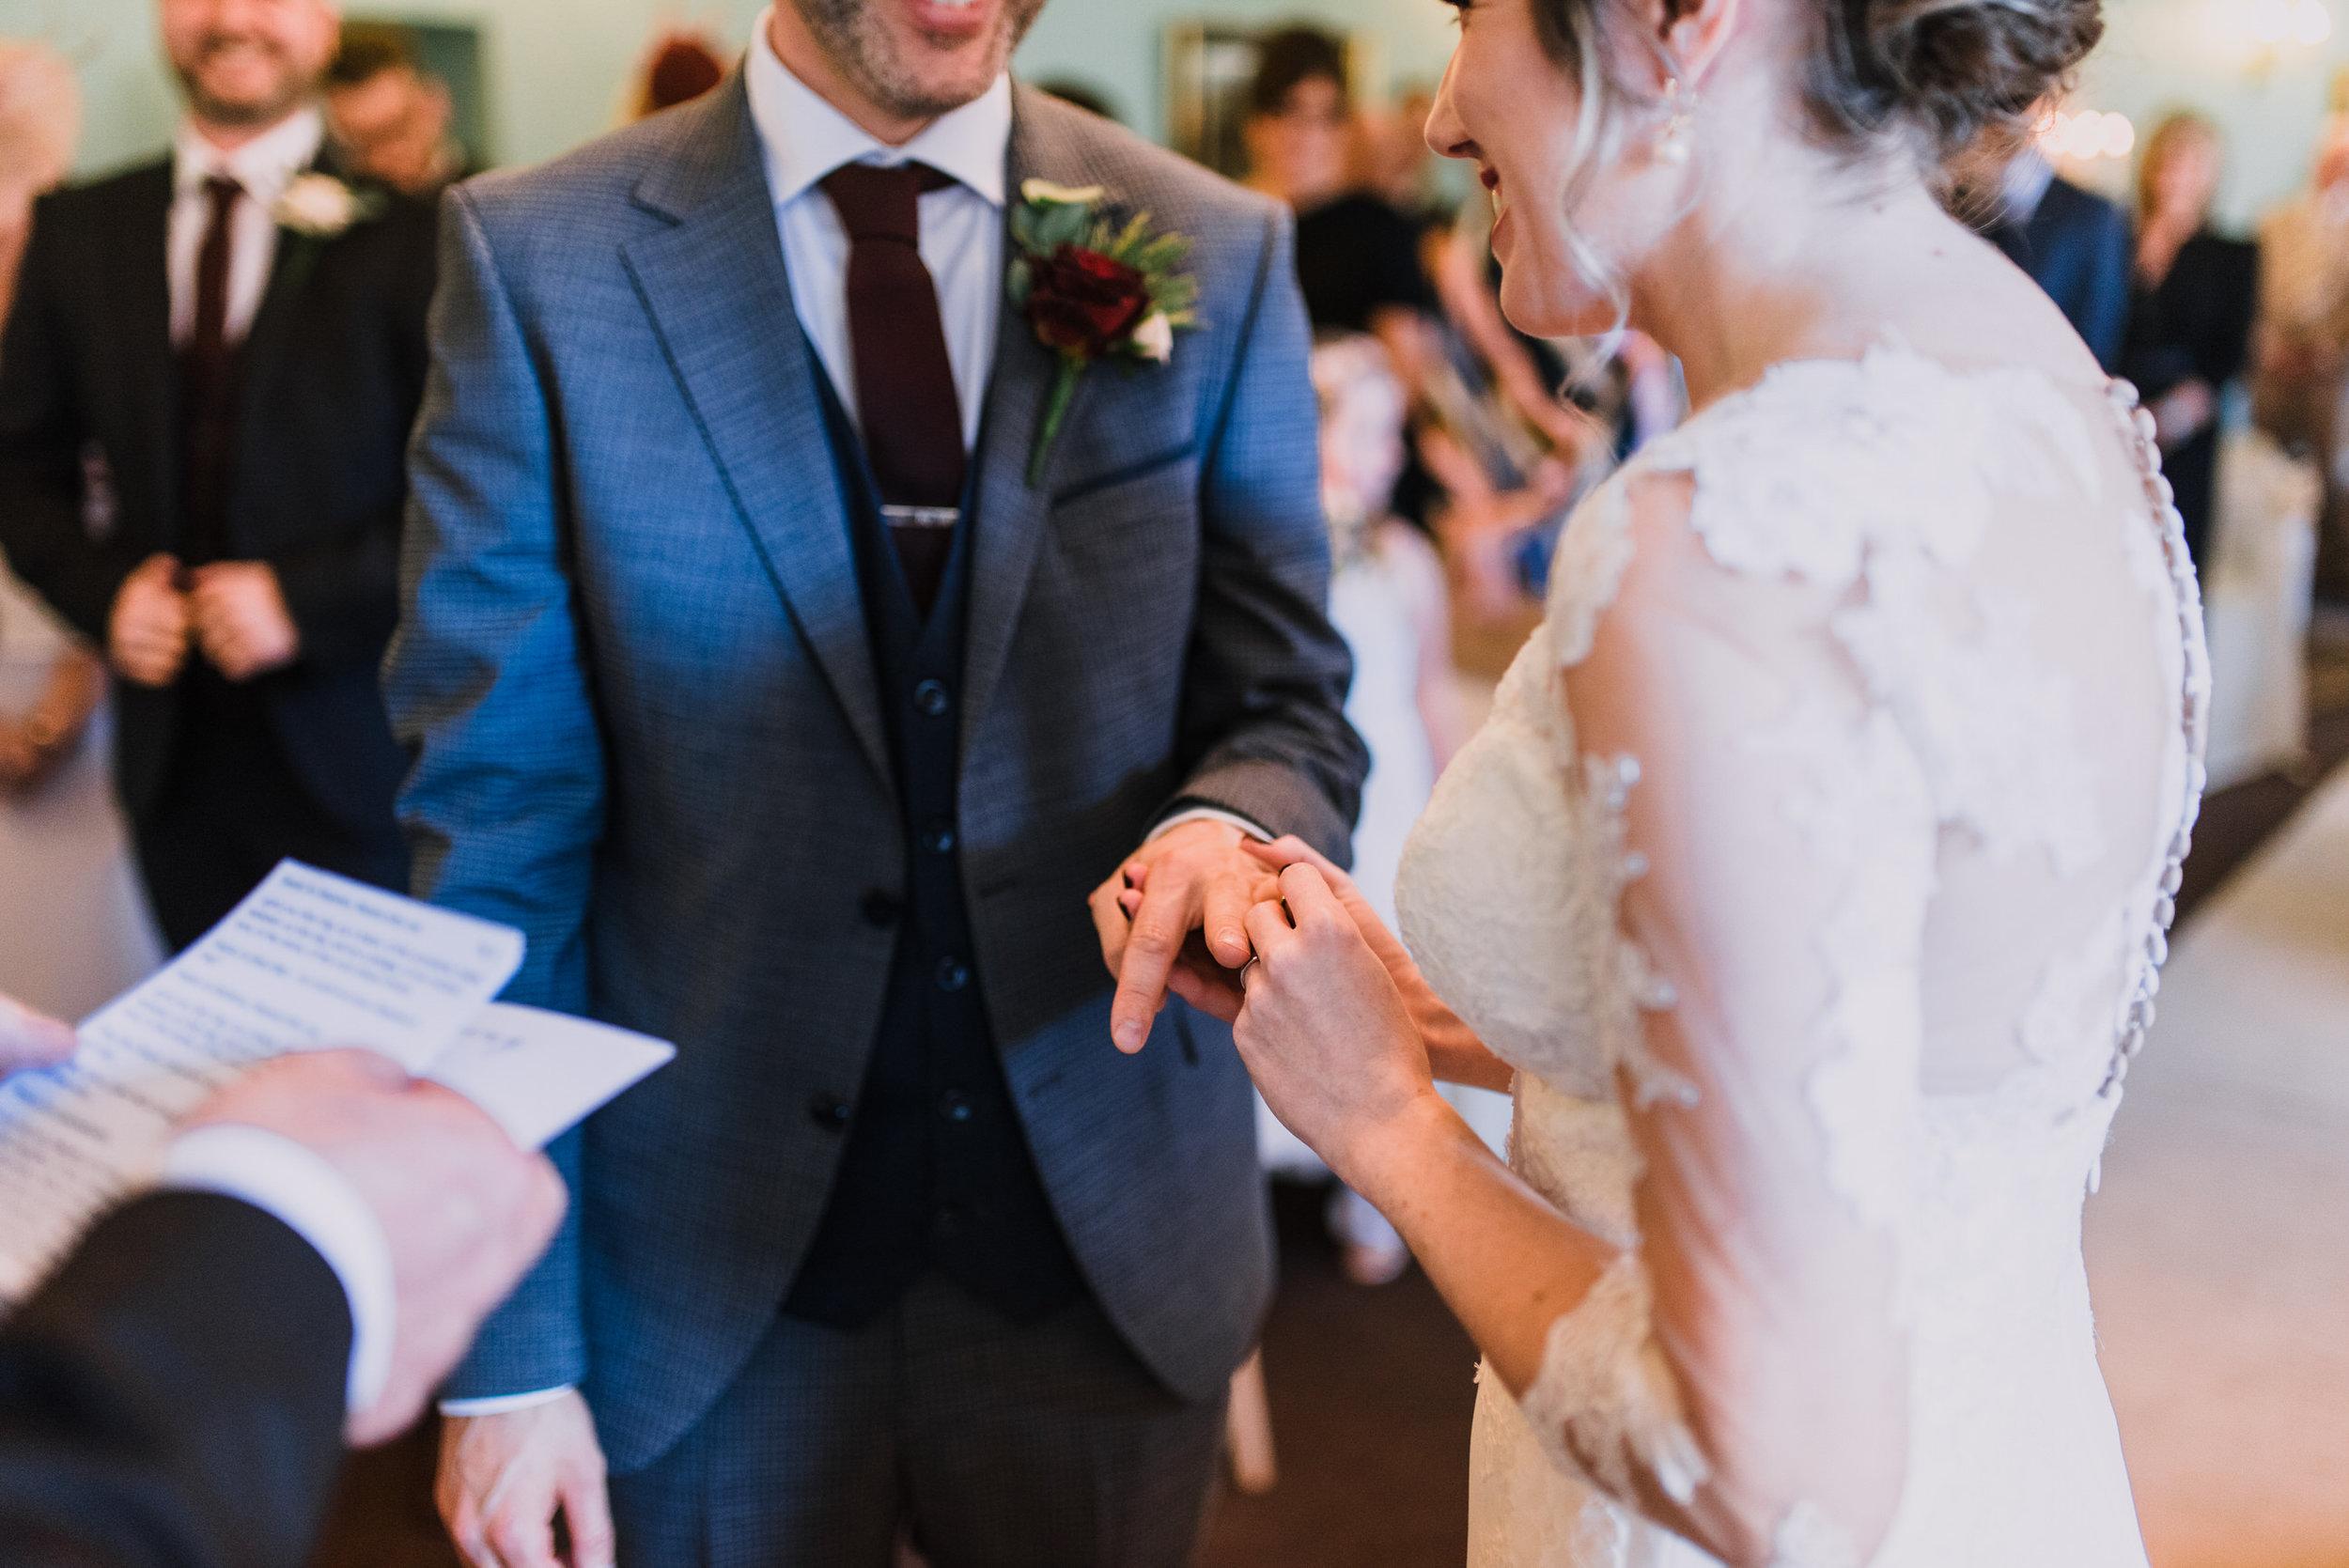 lissanoure castle wedding, northern ireland wedding photographer, romantic northern irish wedding venue, castle wedding ireland, natural wedding photography ni (56).jpg